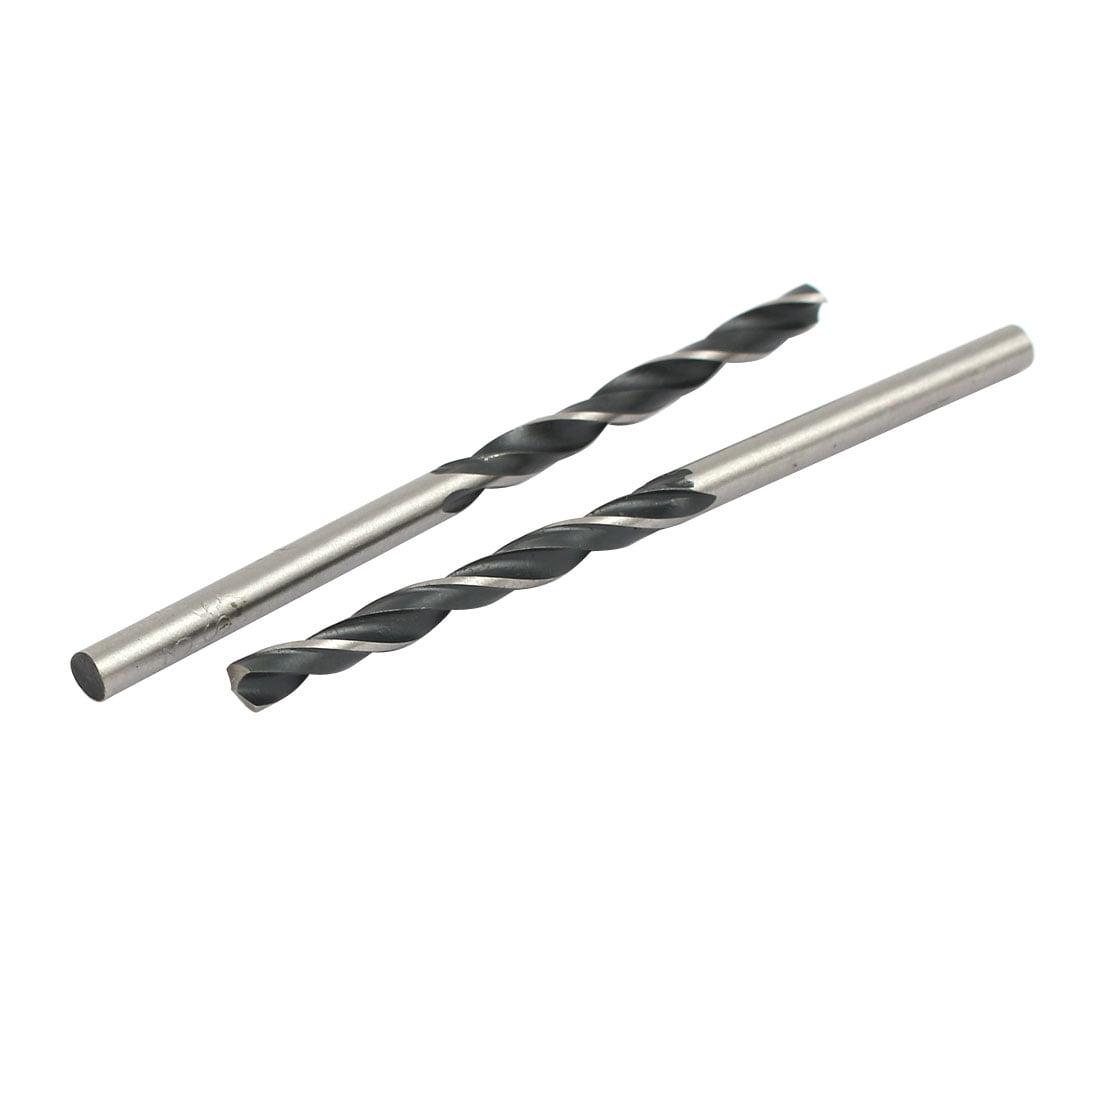 3mm Dia 59mm Length HSS 9341 Round Shank Twist Drill Bit Drilling Tool 10pcs - image 3 of 4